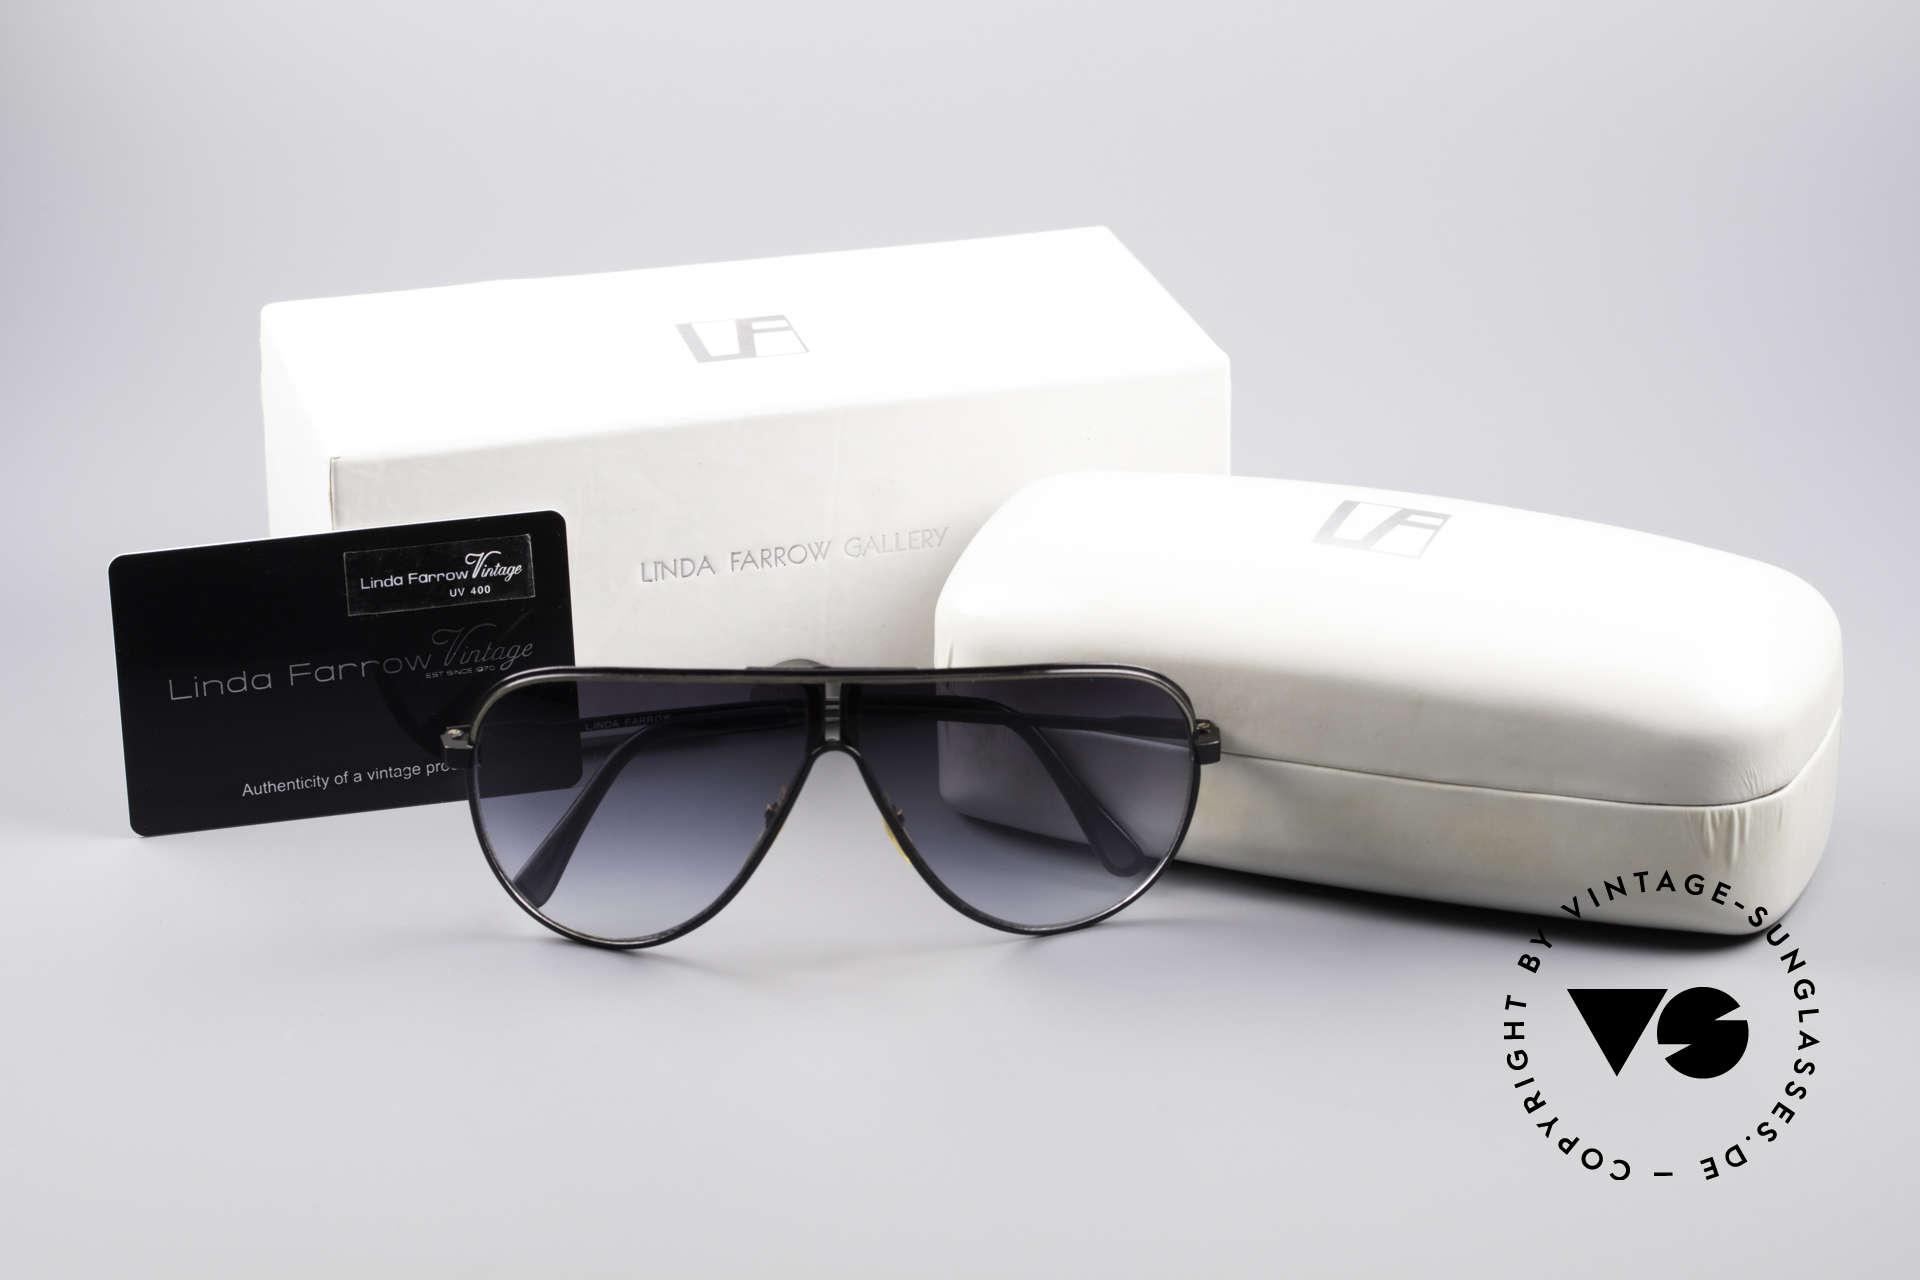 c59123a6d36a Sunglasses Linda Farrow 6031 Scarface Movie Glasses